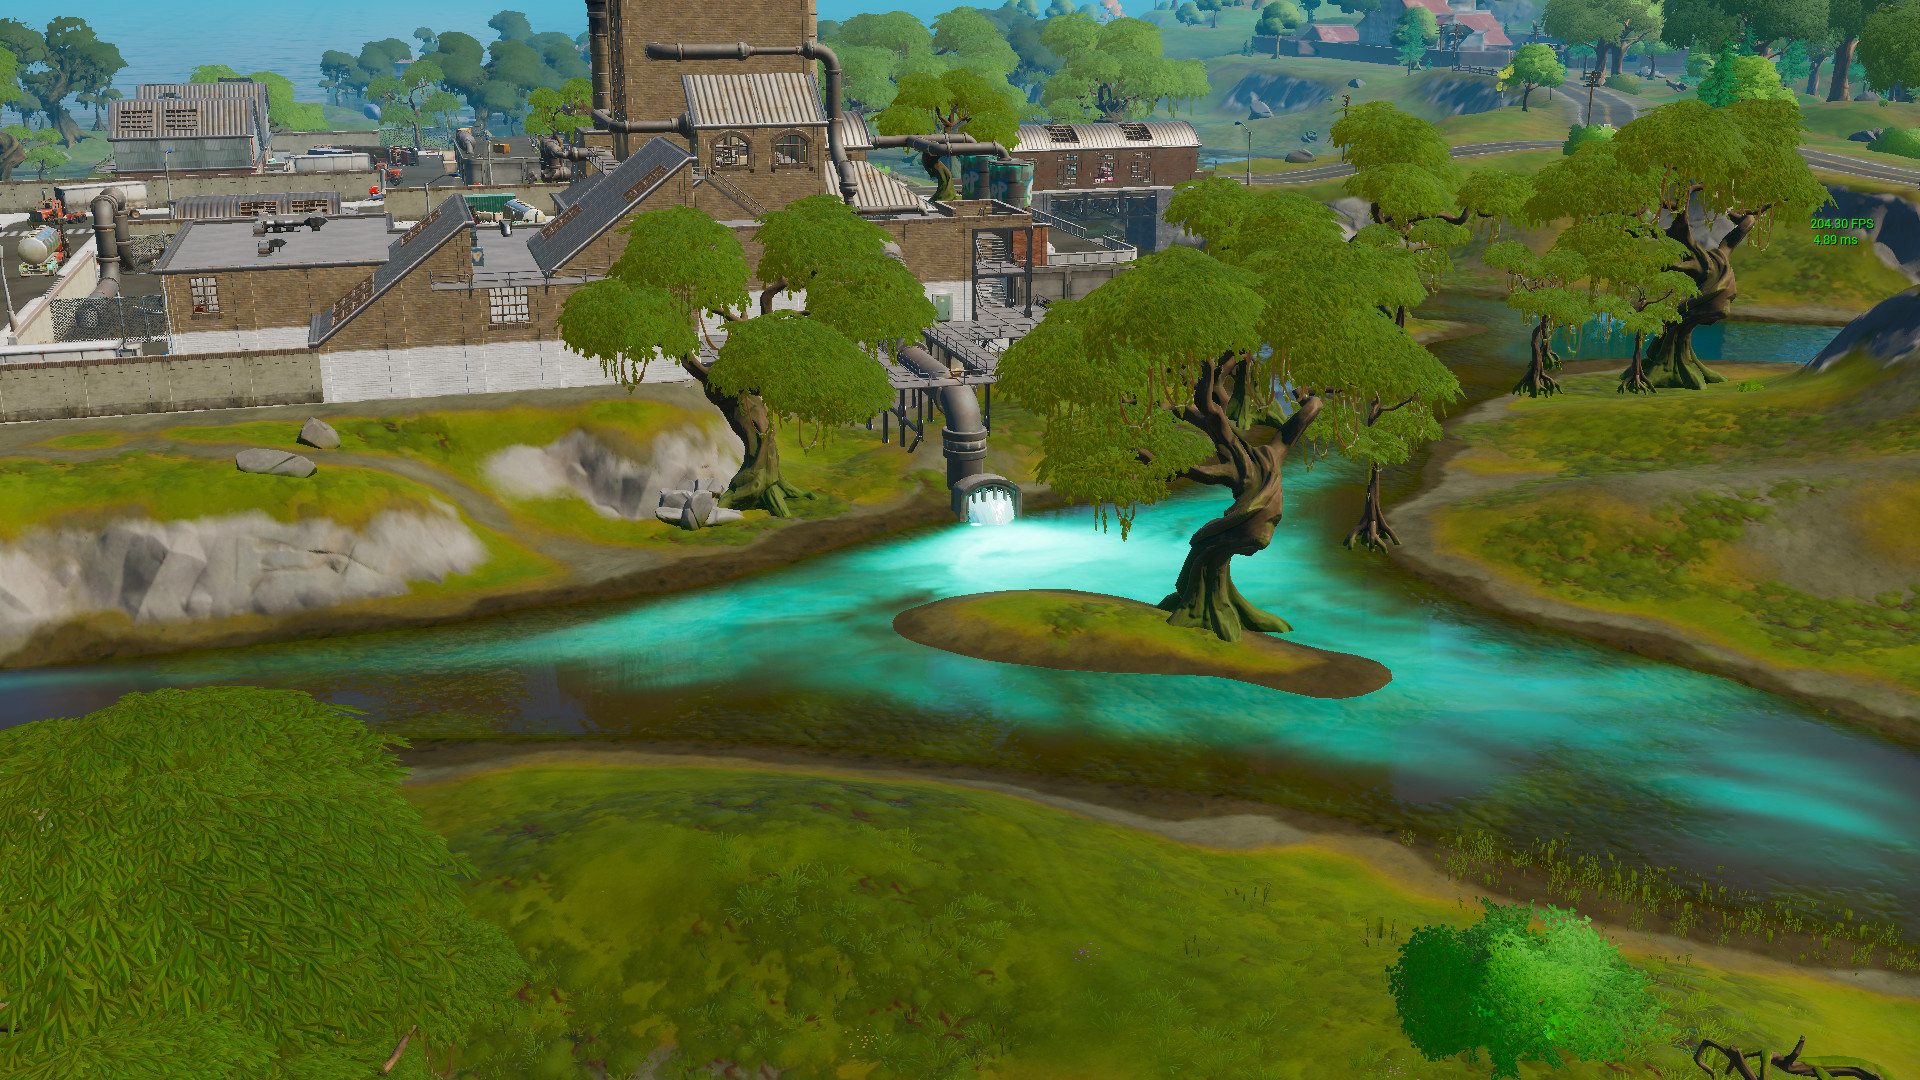 Fortnite Slurpy Swamp